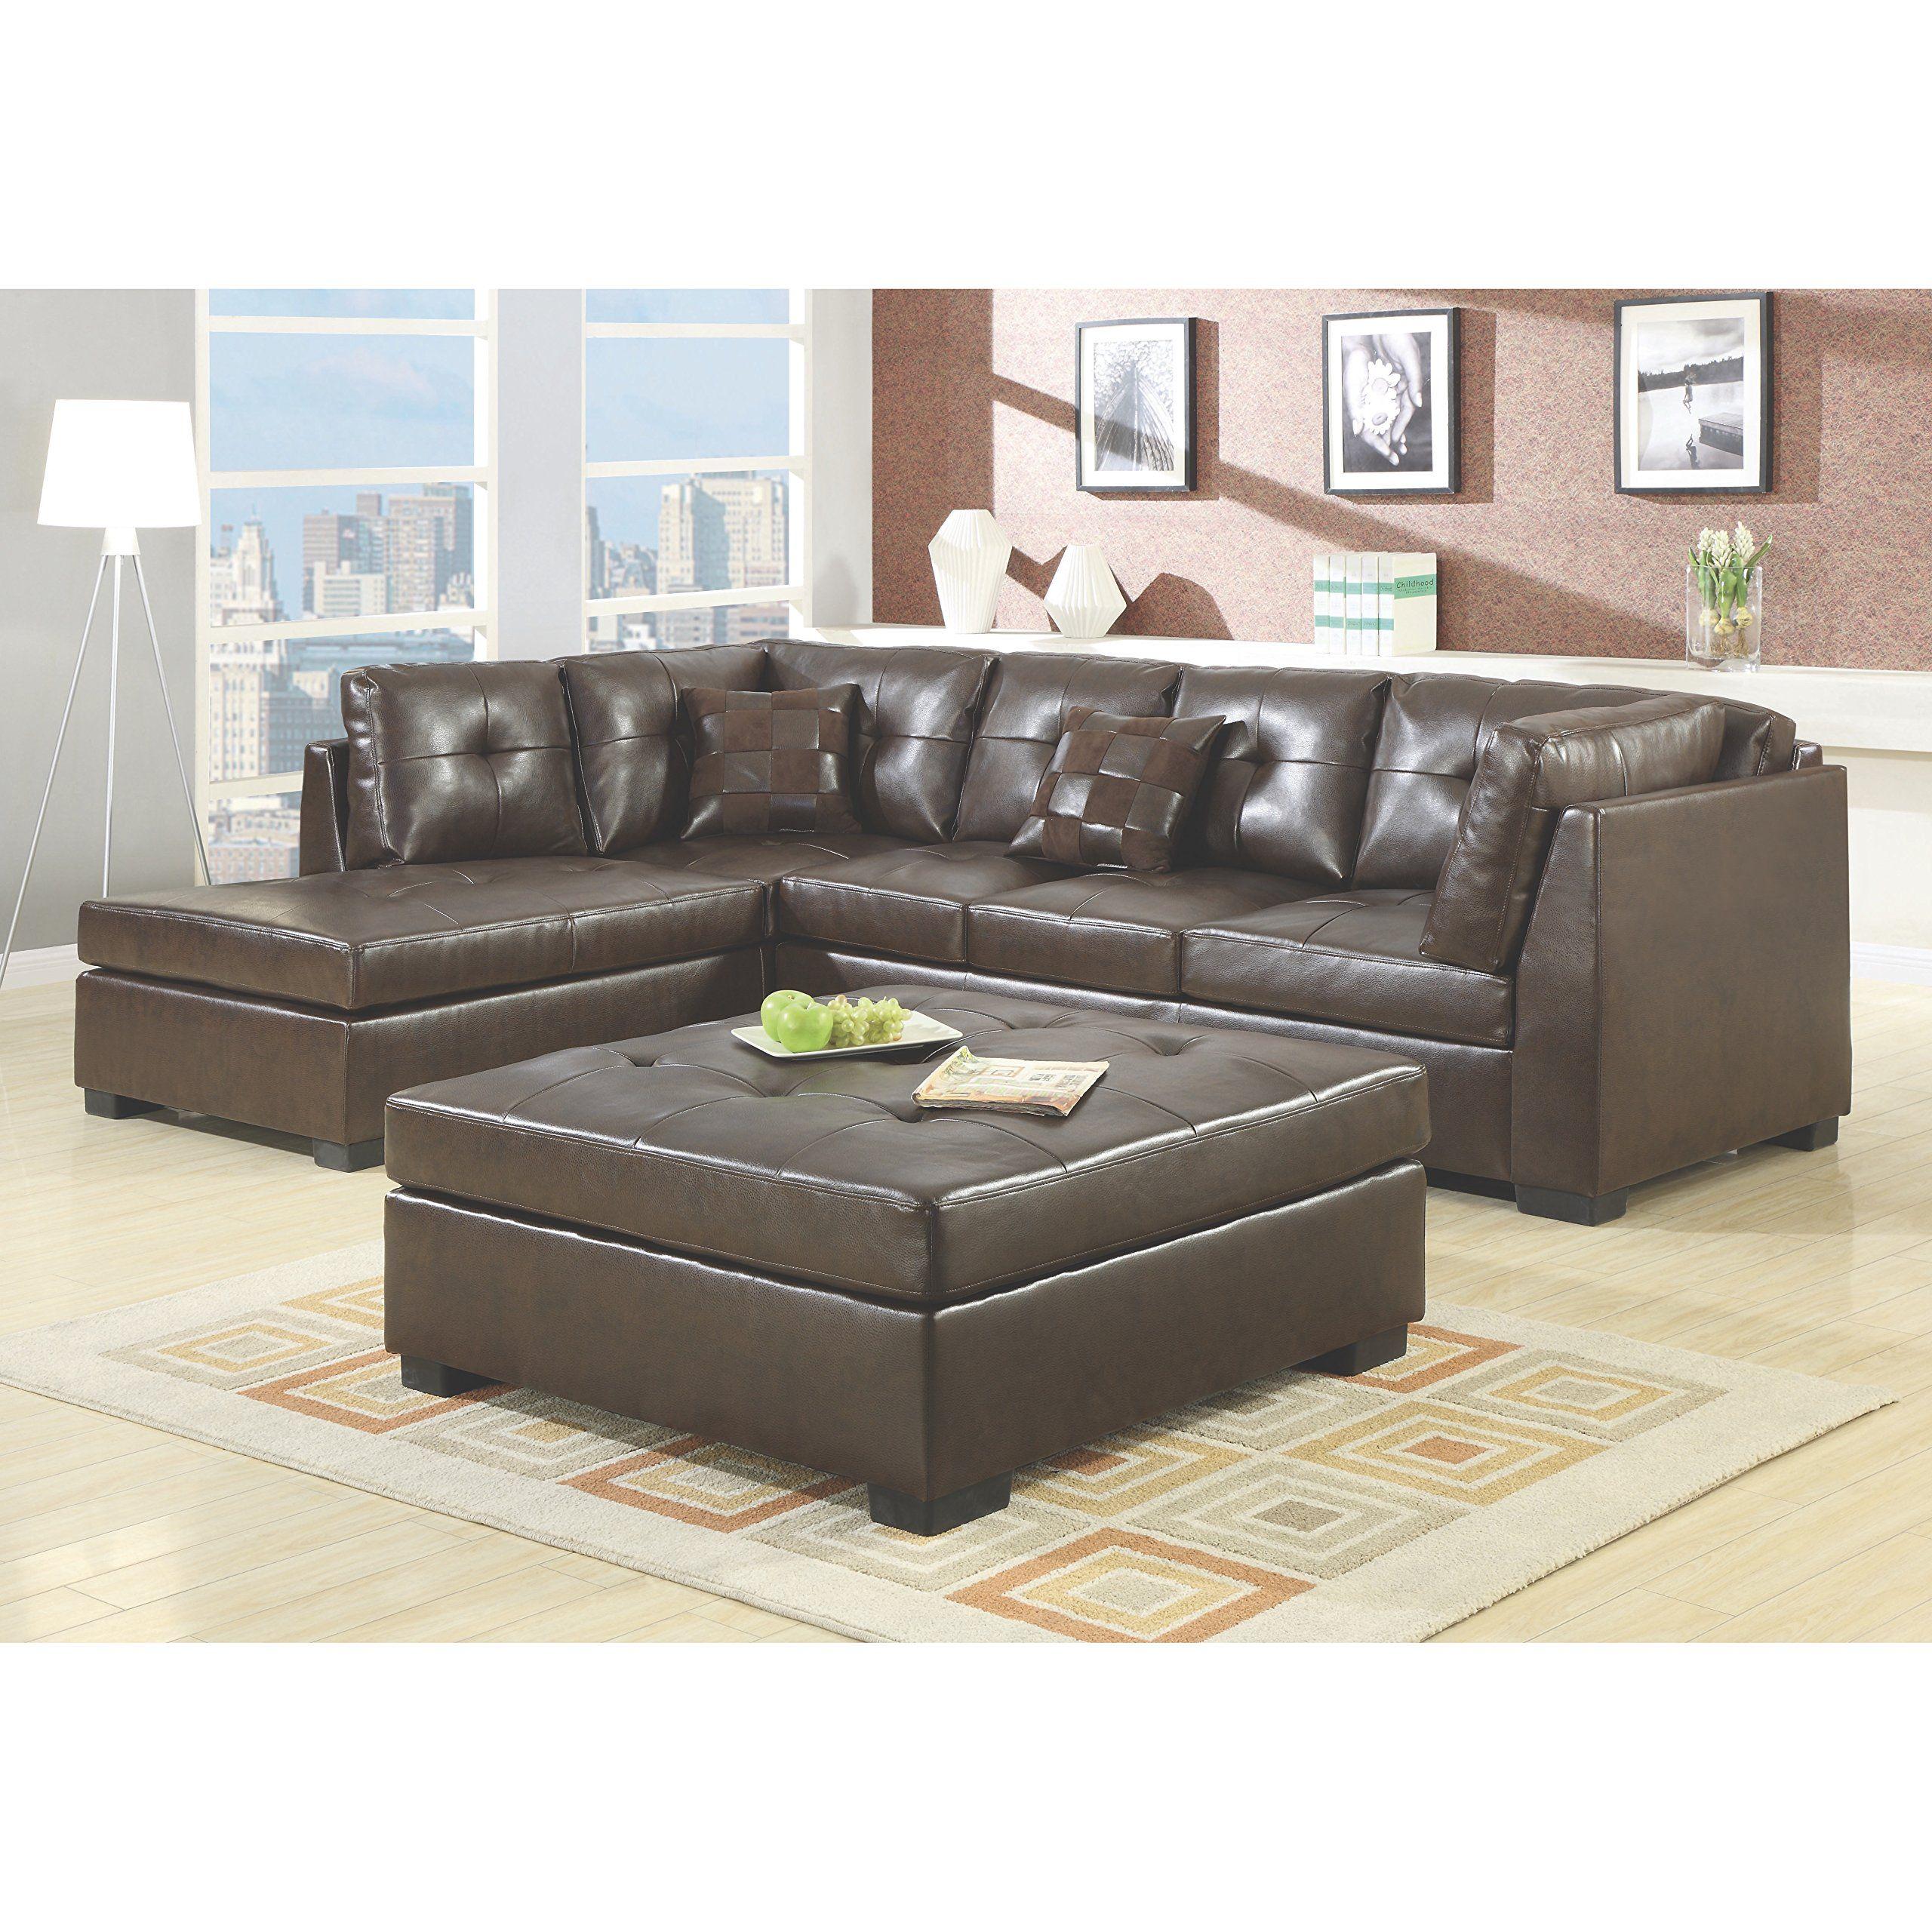 Coaster Home Furnishings 500686 Casual Sectional Sofa Brown Brown Sectional Sofa Contemporary Sectional Sofa Sectional Sofa